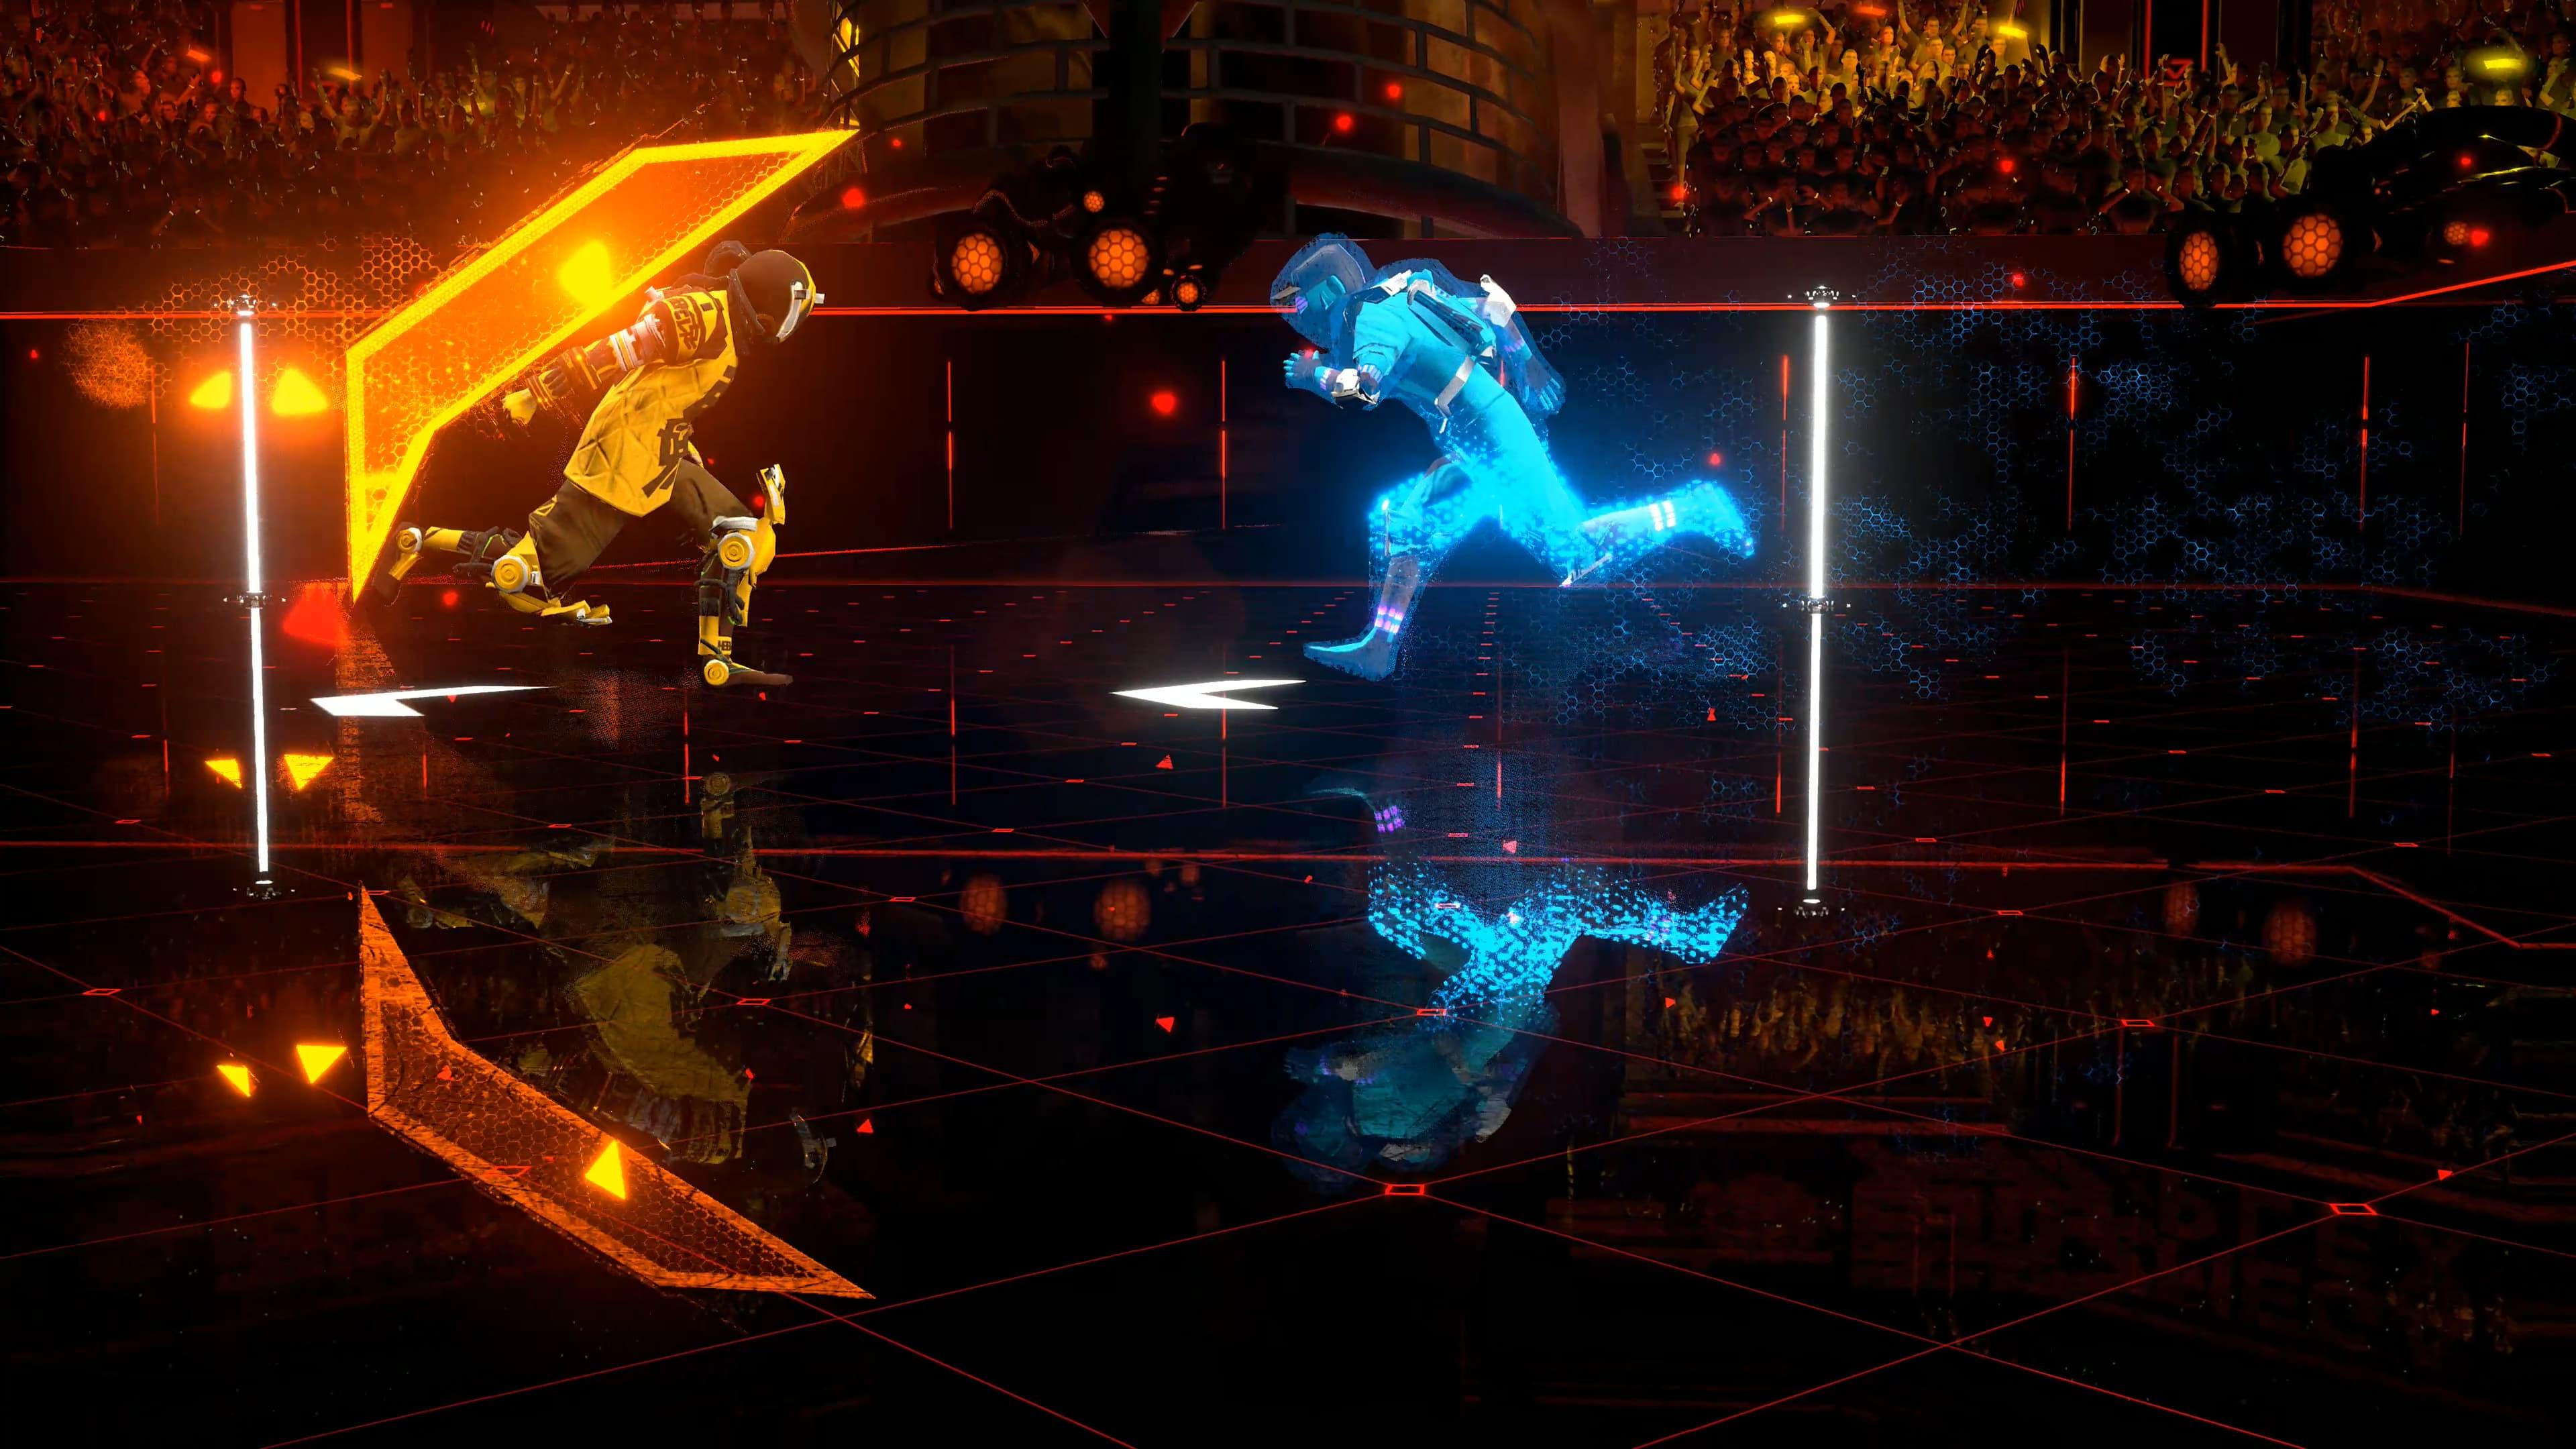 Xbox One Laser League